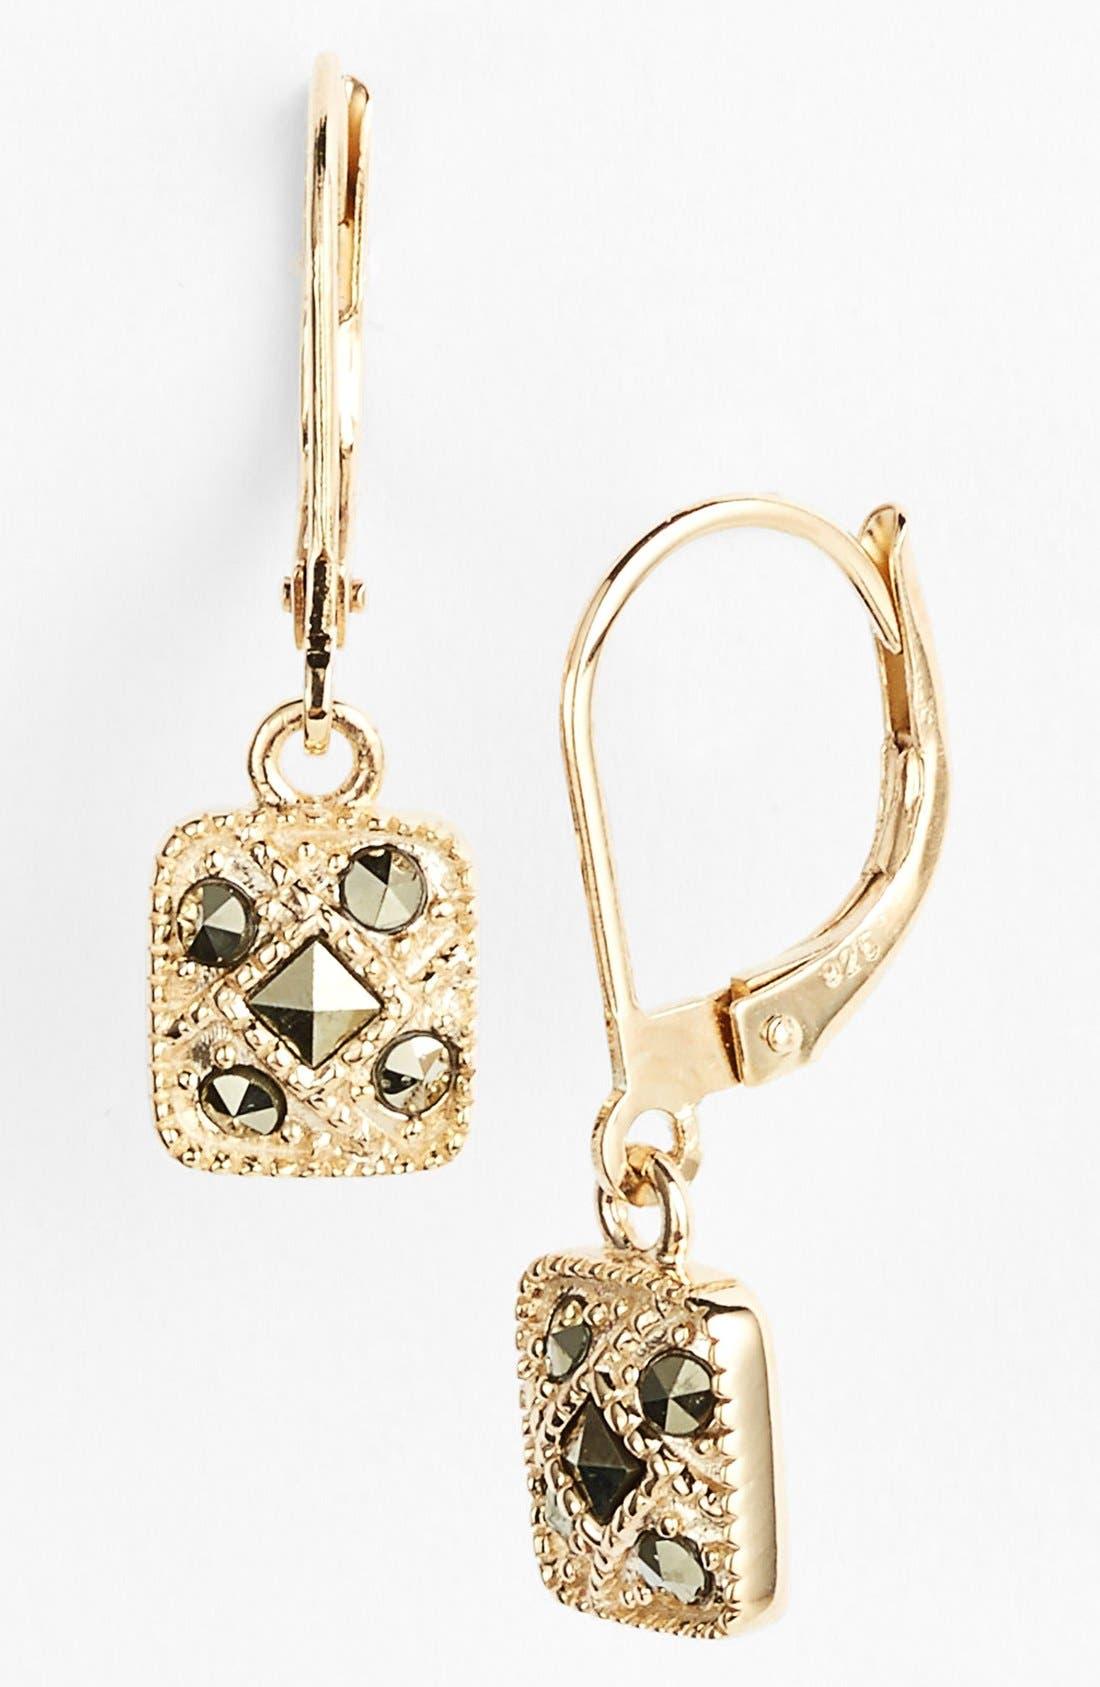 Square Drop Earrings,                             Main thumbnail 1, color,                             GOLD/ MARCASITE